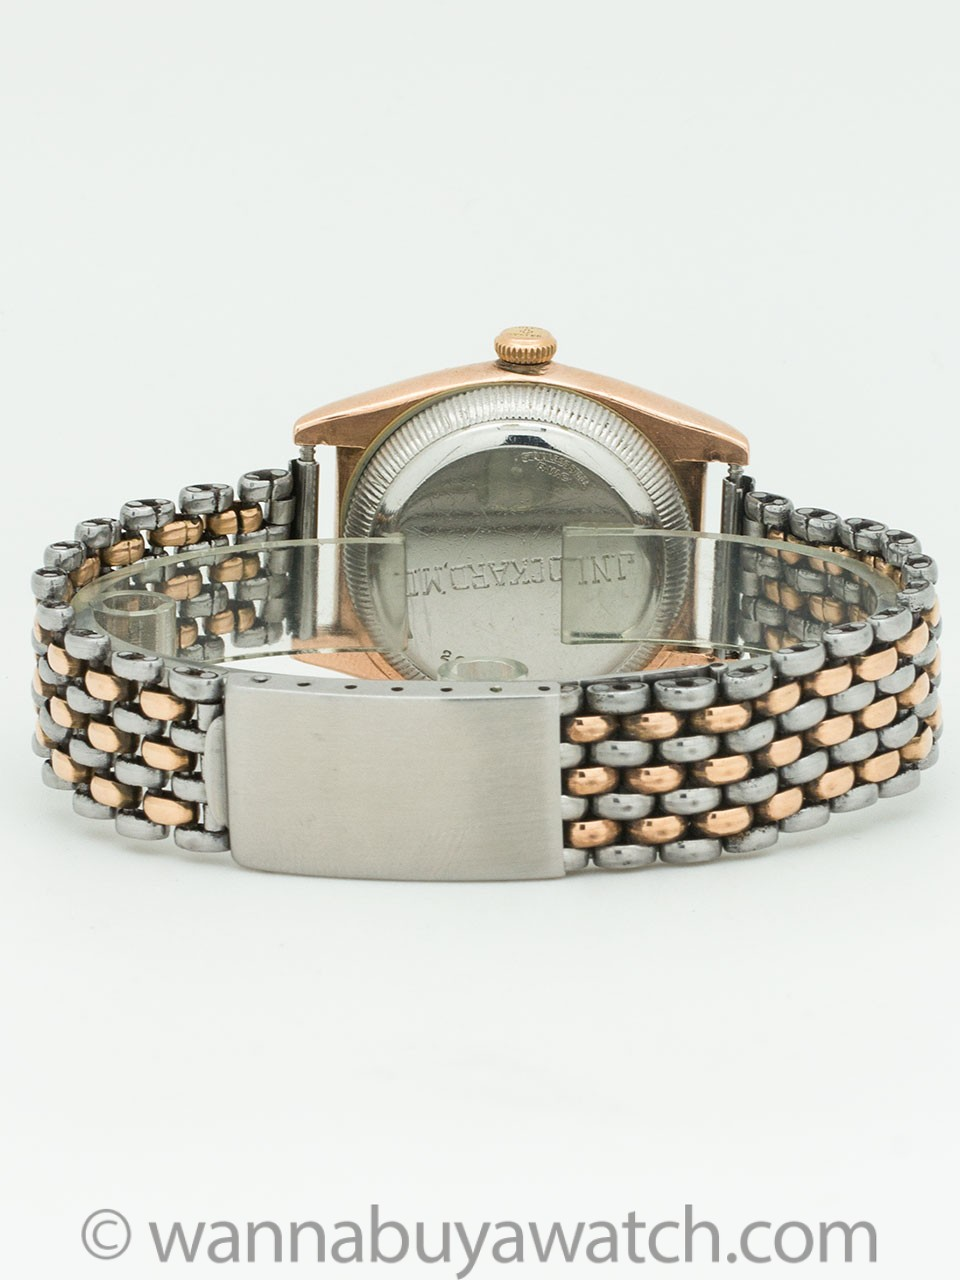 Rolex Bubbleback ref 3725 Stainless & Rose Gold Rice Bracelet Shipping Box circa 1944